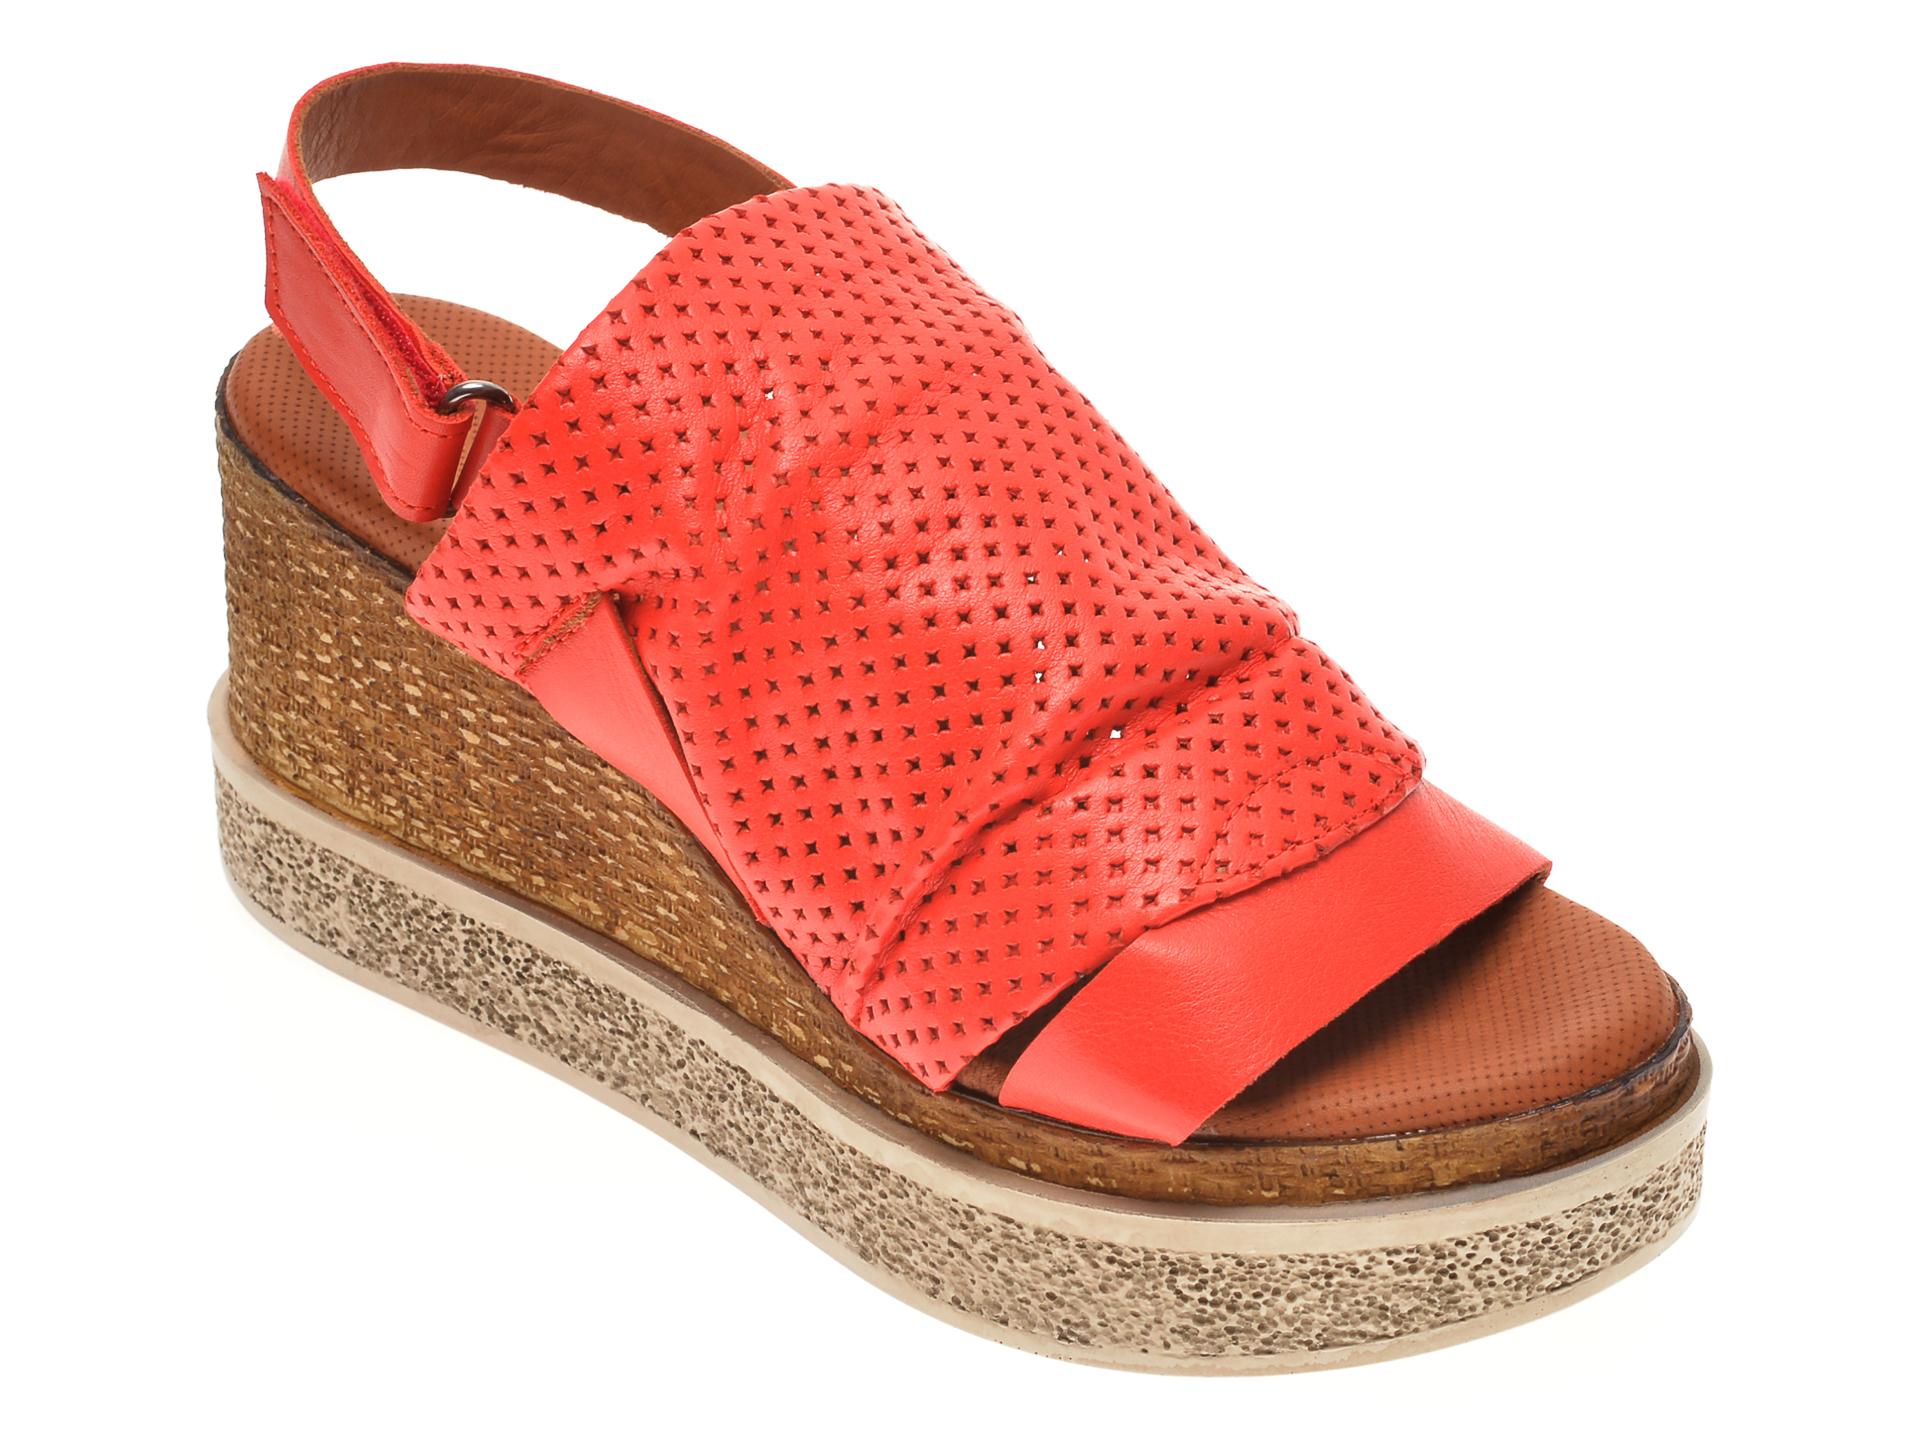 Sandale BABOOS rosii, 852507, din piele naturala imagine